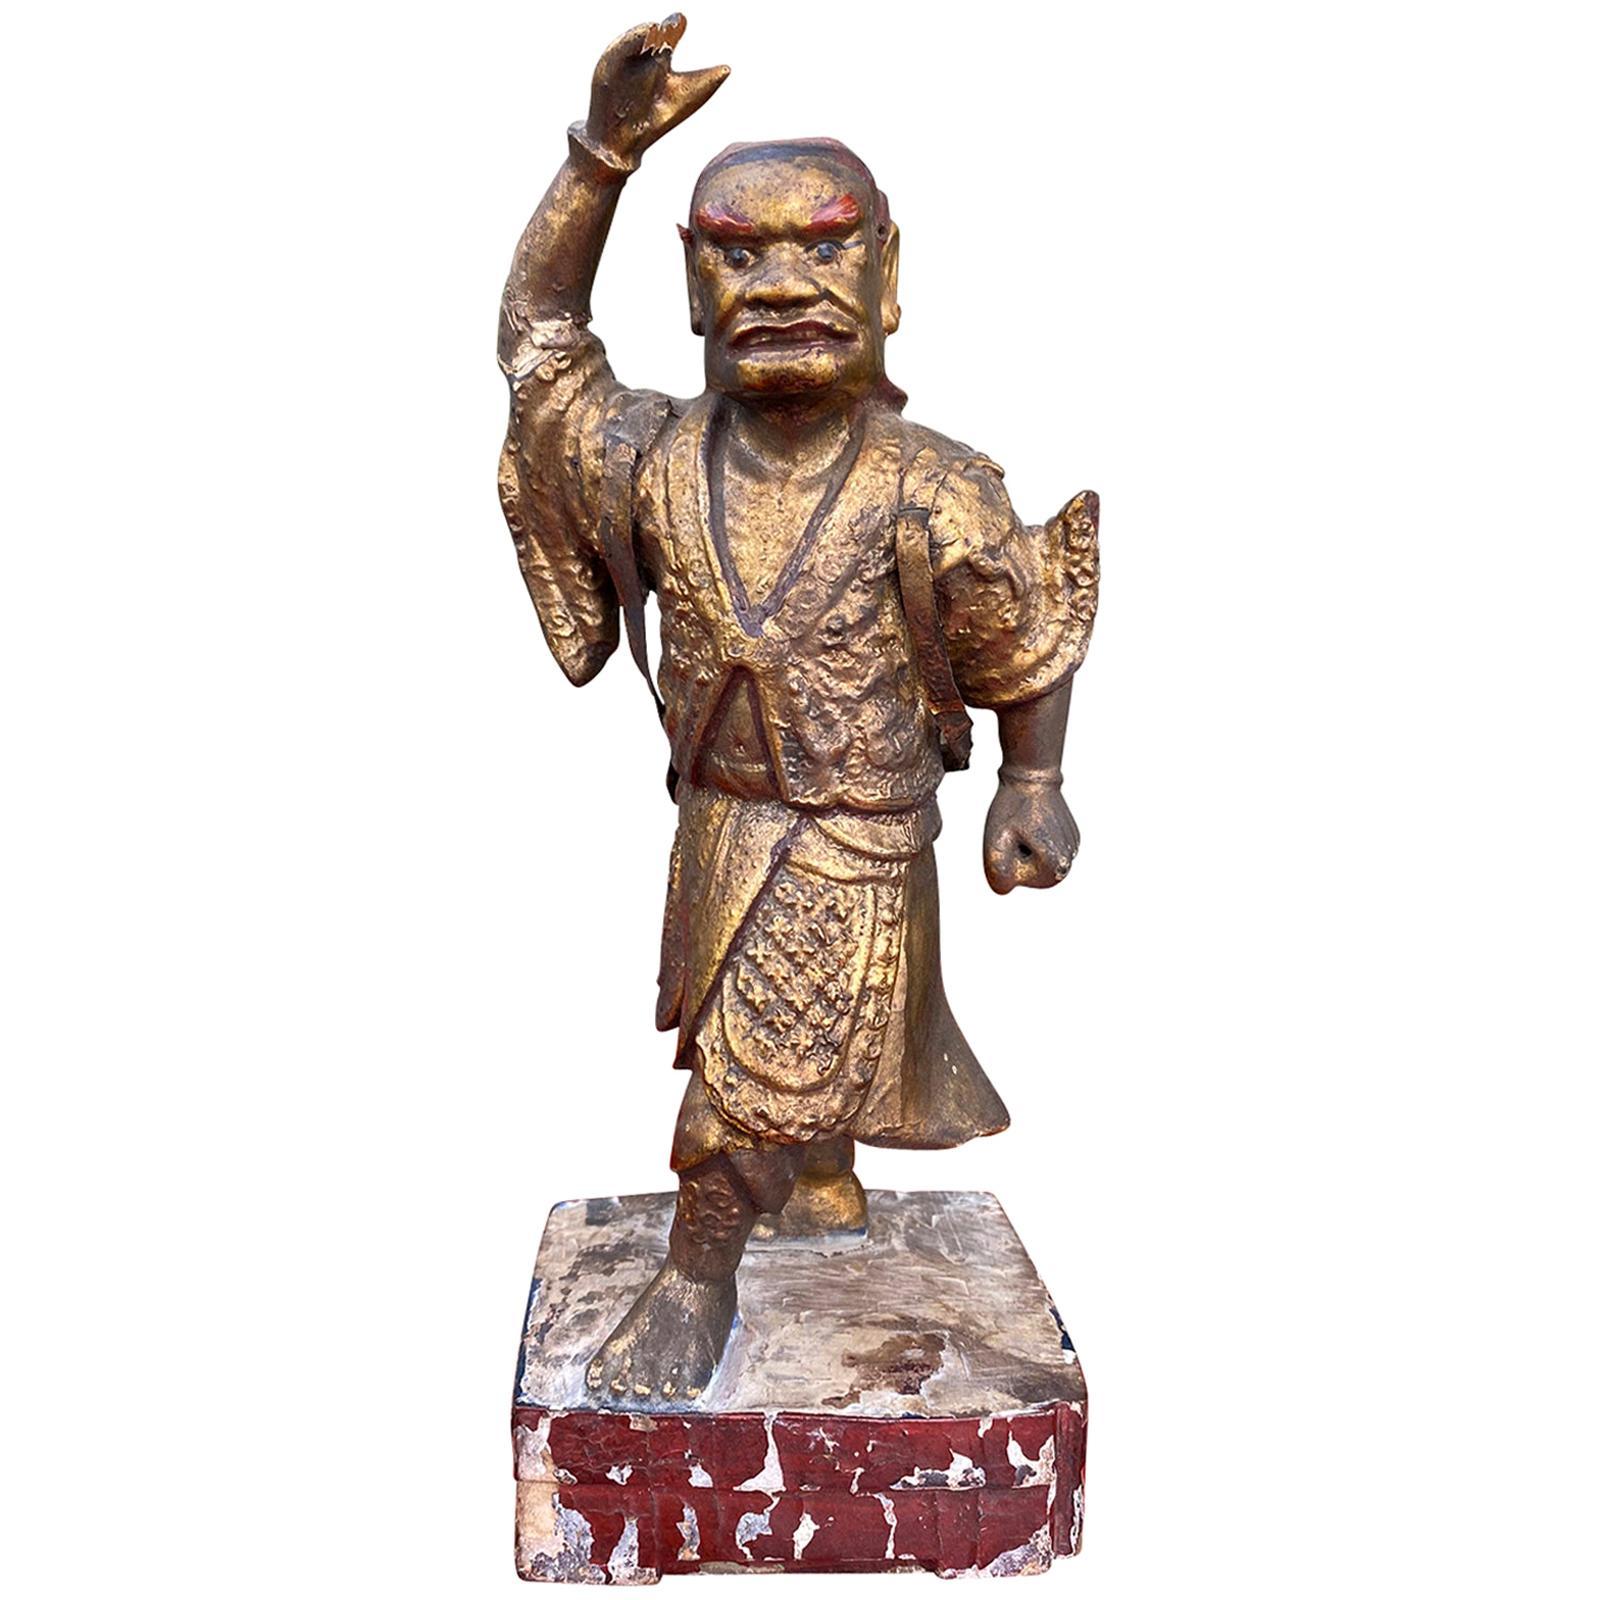 18th-19th Century Giltwood Samurai Figure